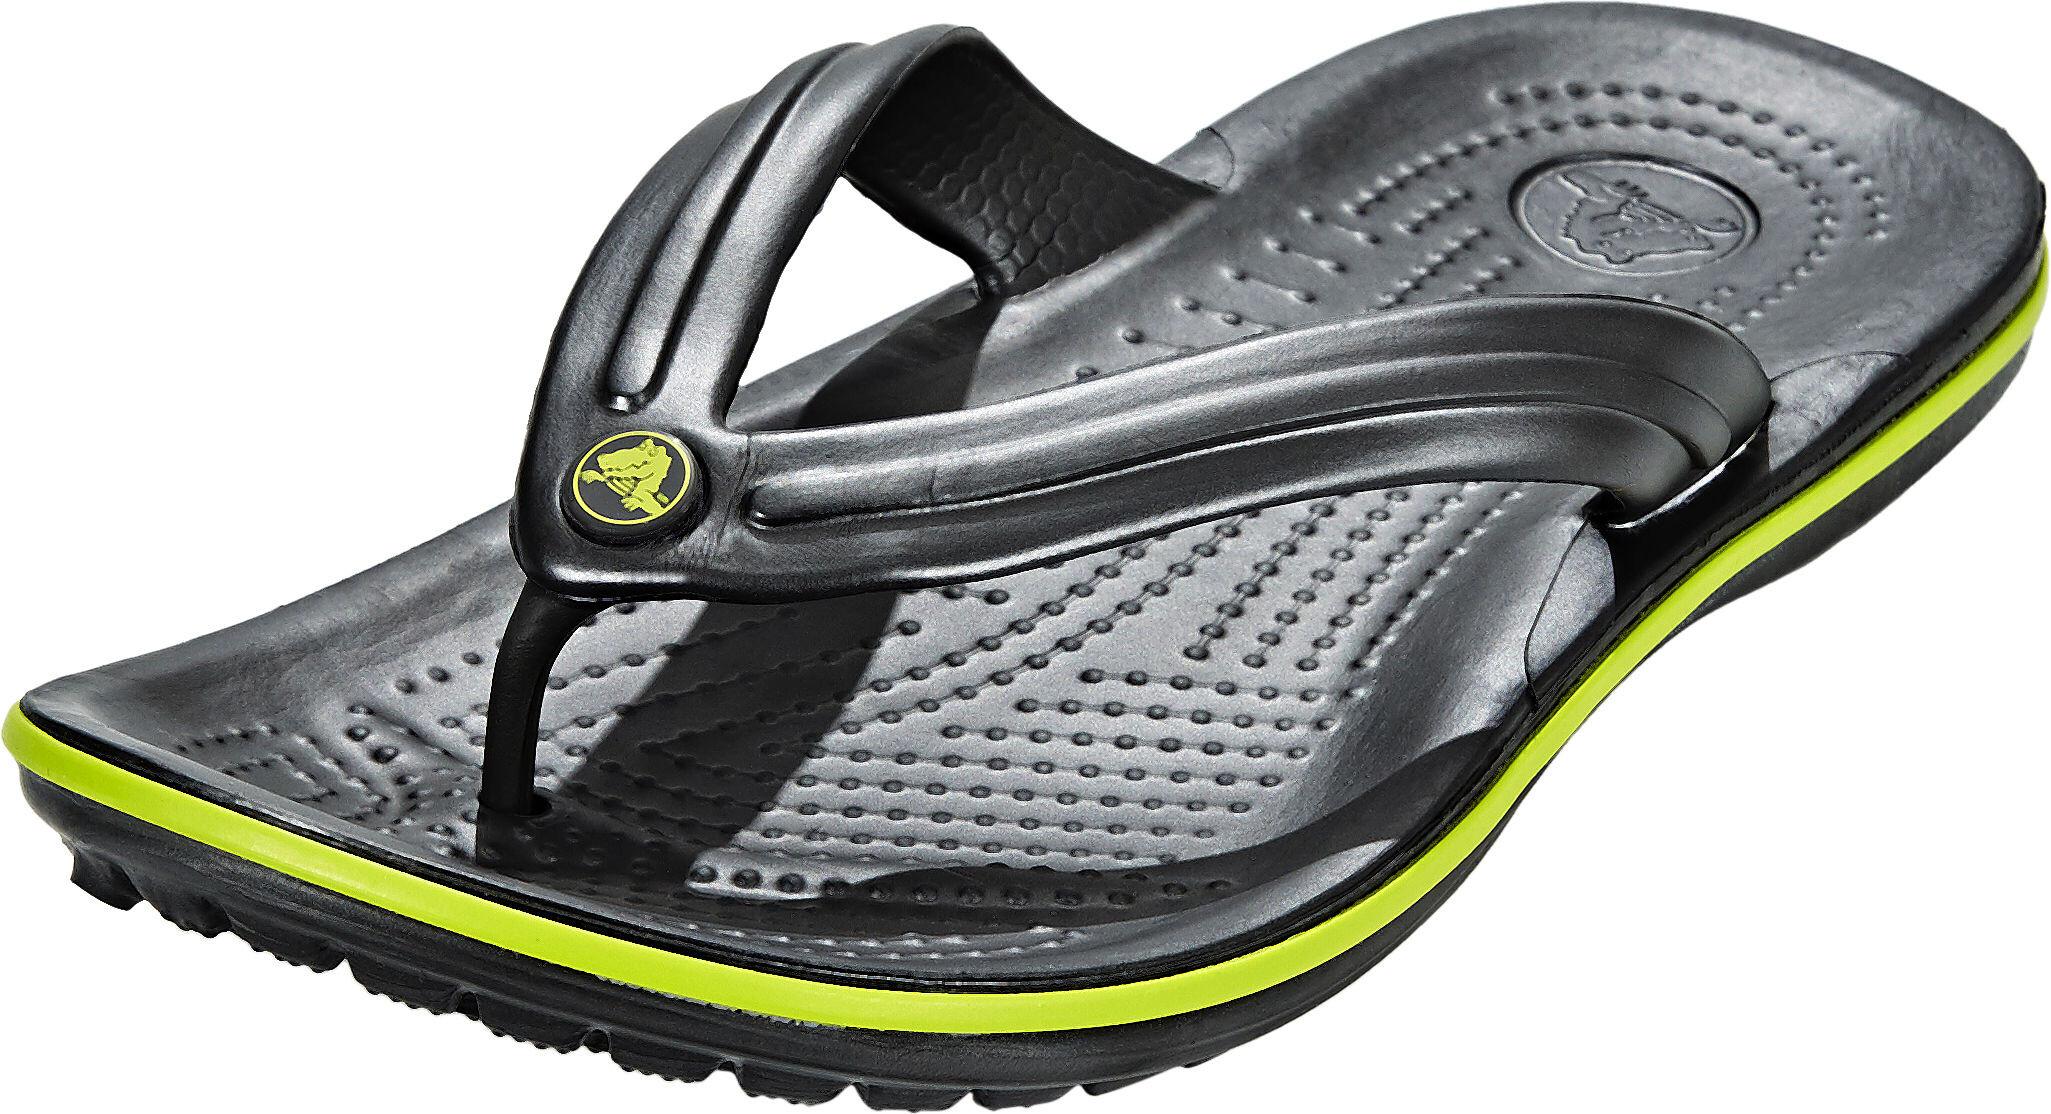 27f905636a12 Crocs Crocband Flip Sandals Unisex graphite volt green